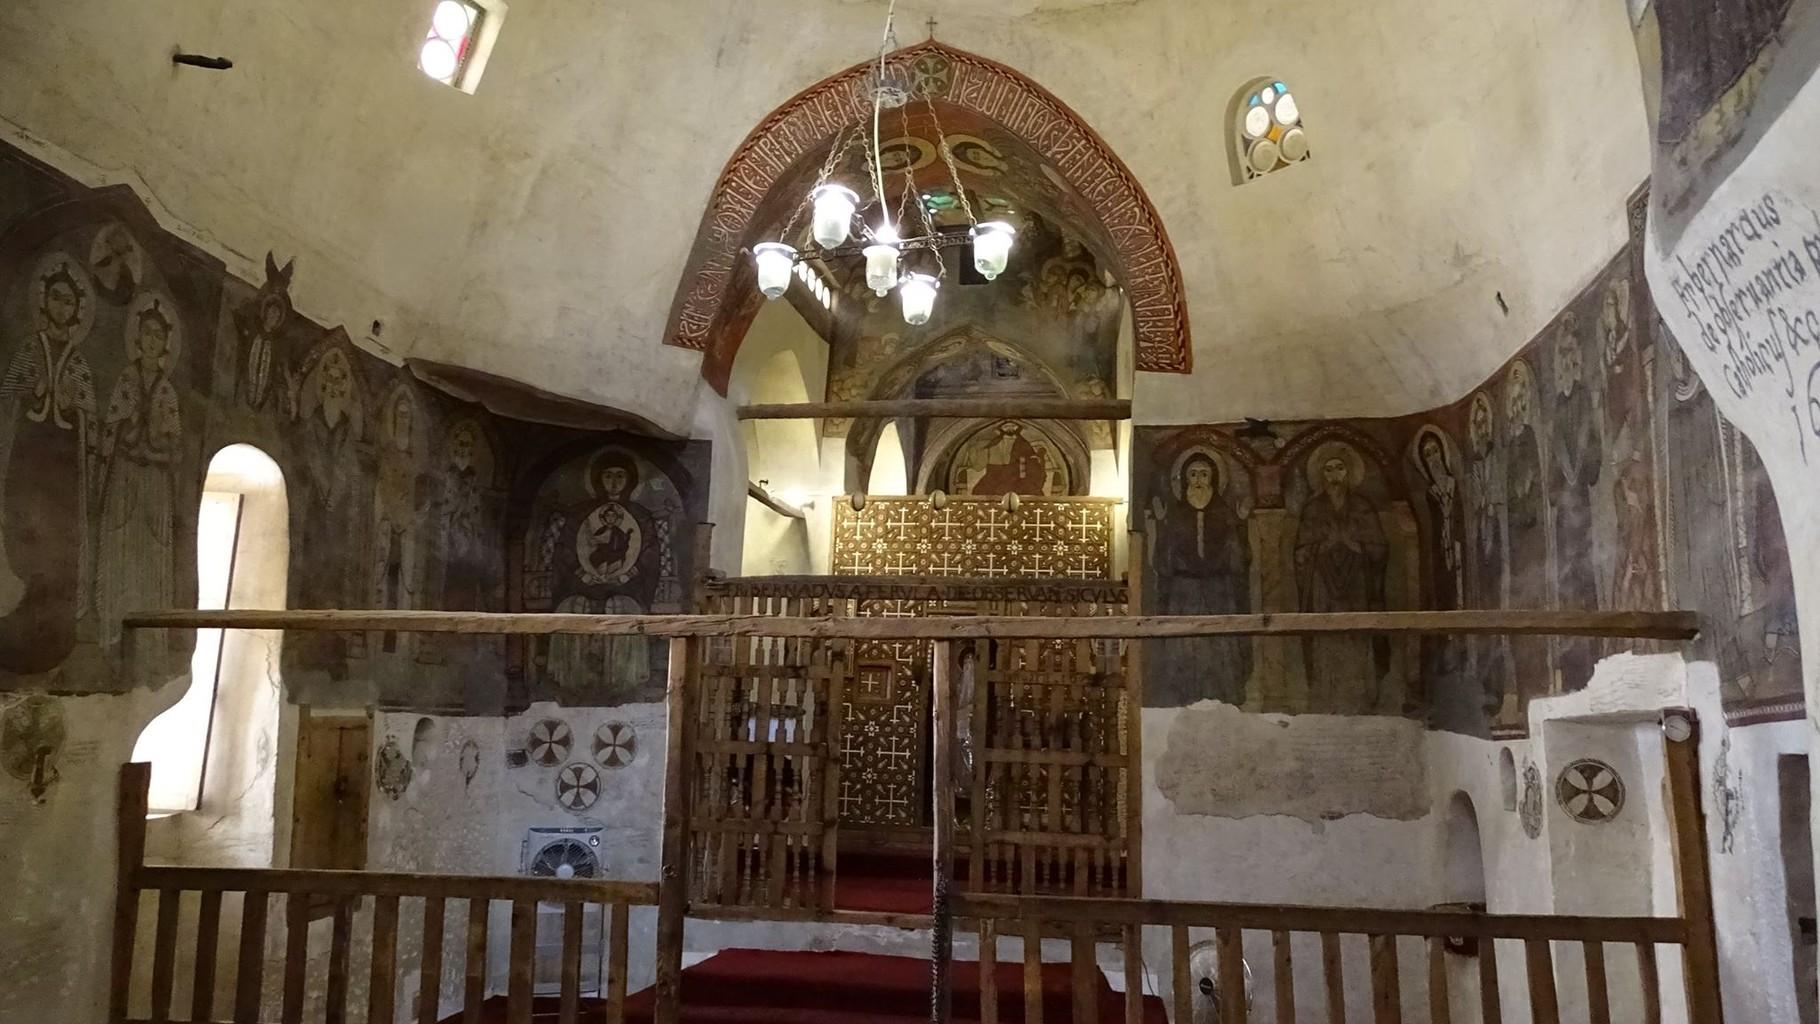 ... mit dem Altar für St. Antonius.